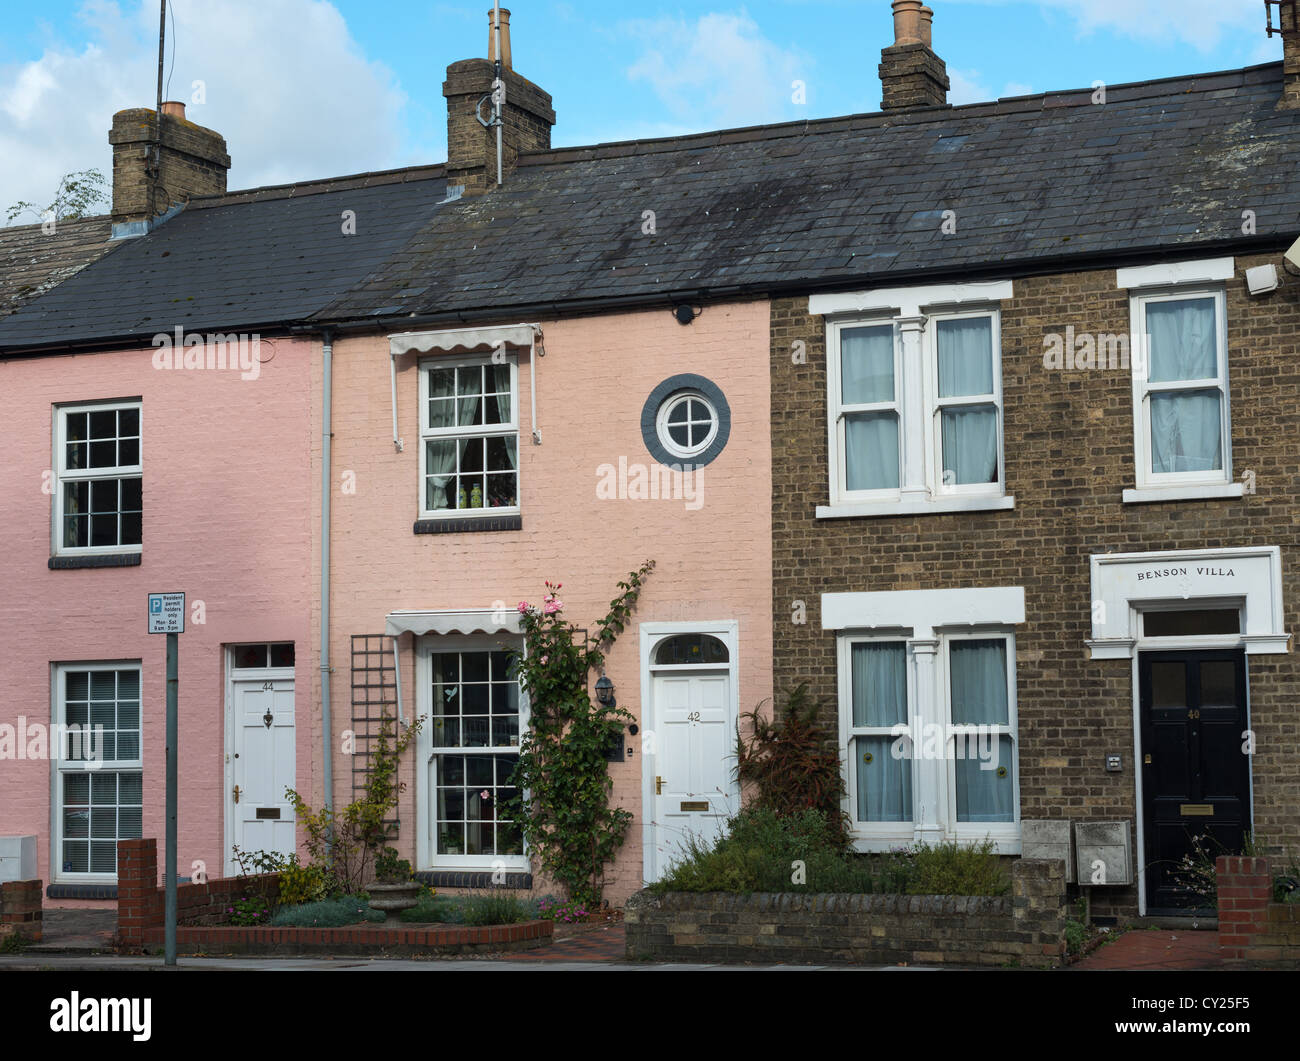 Old Terraced House Uk Stockfotos & Old Terraced House Uk Bilder - Alamy